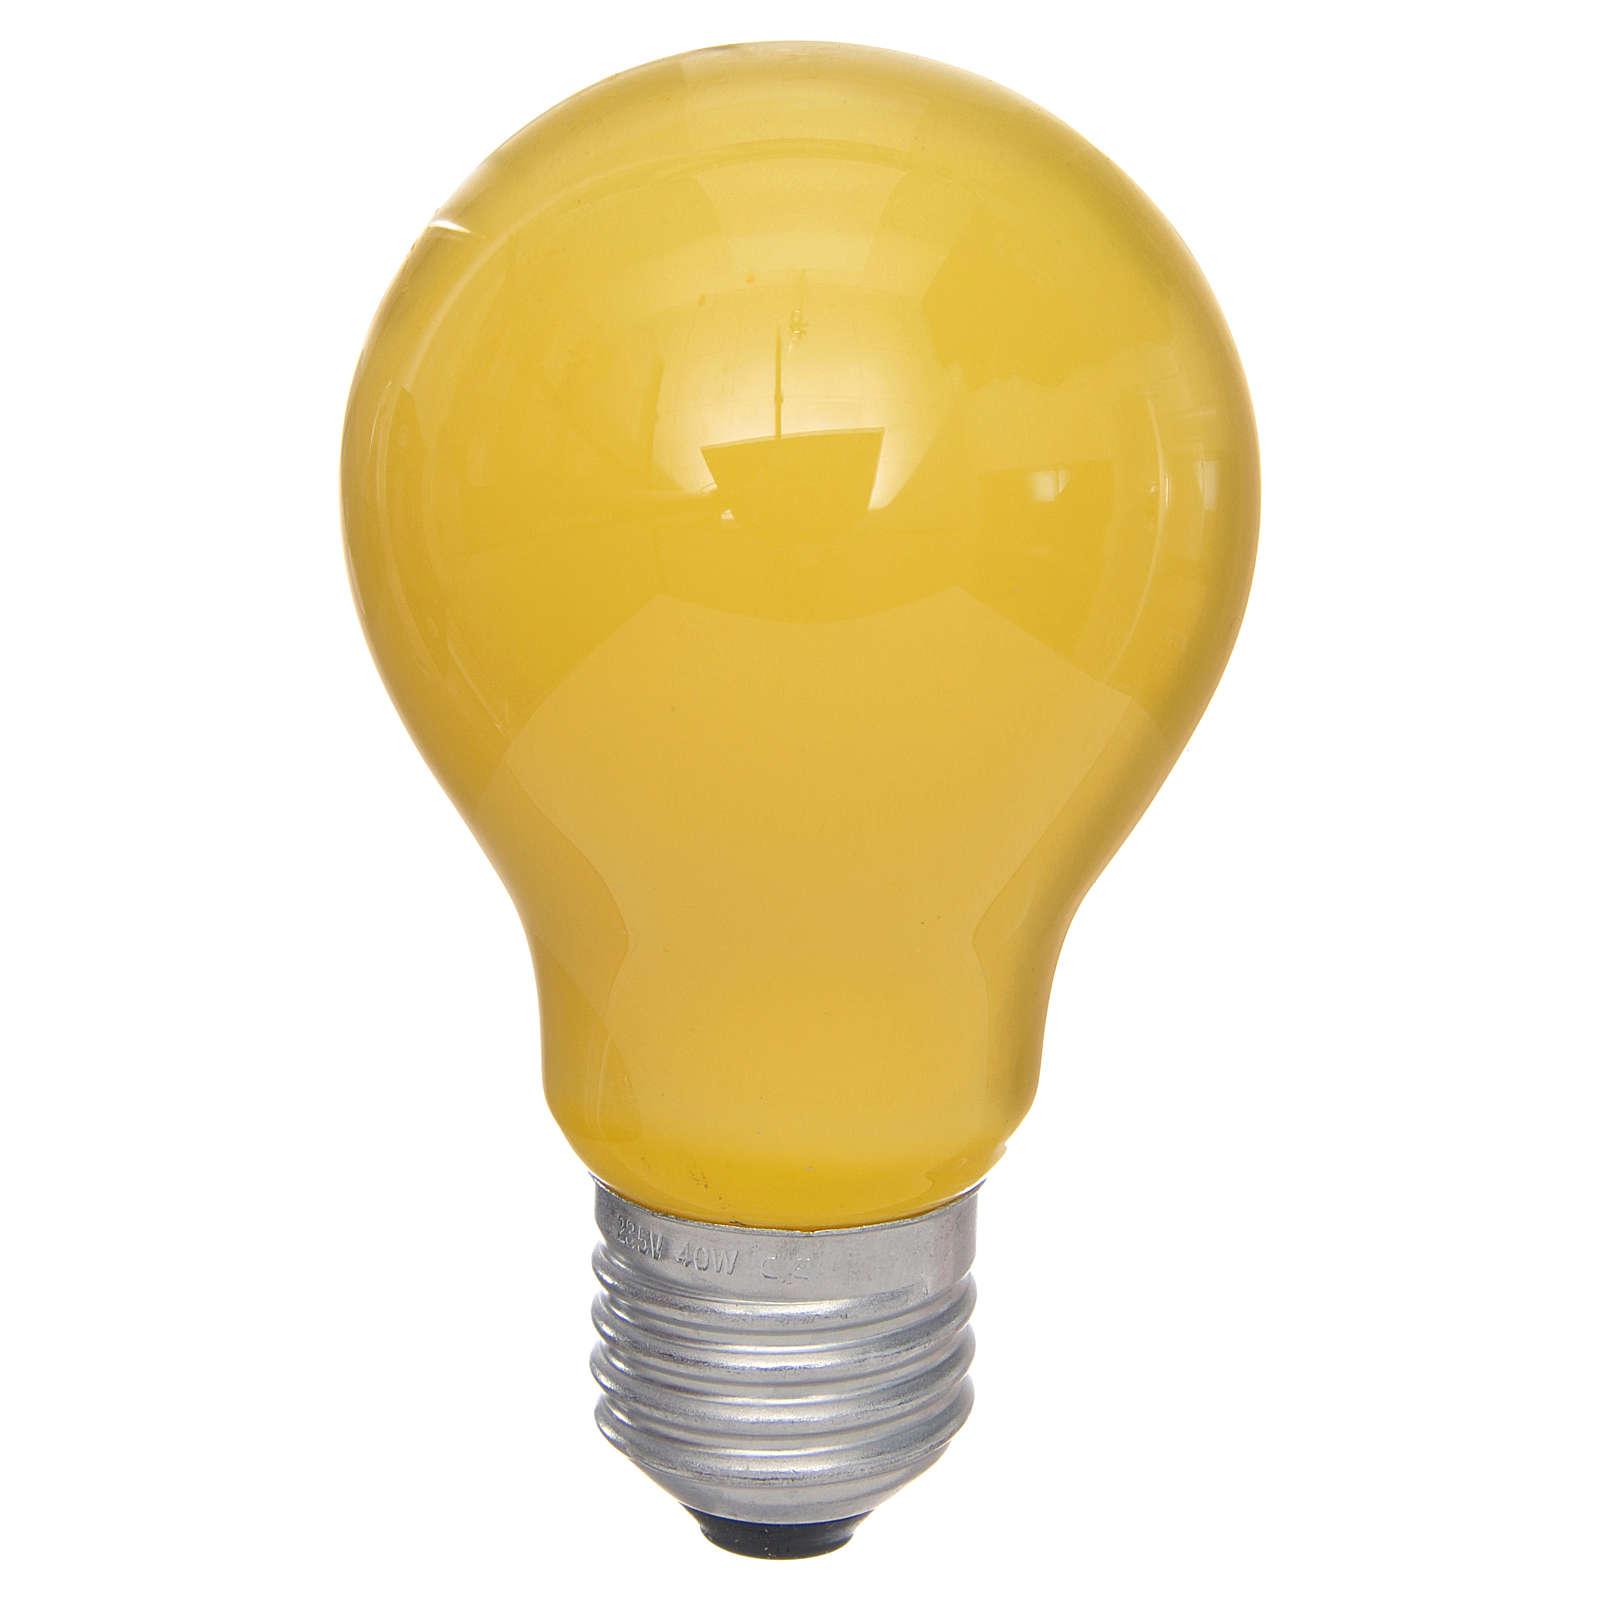 Bombilla 40W E27 amarilla para belén 4